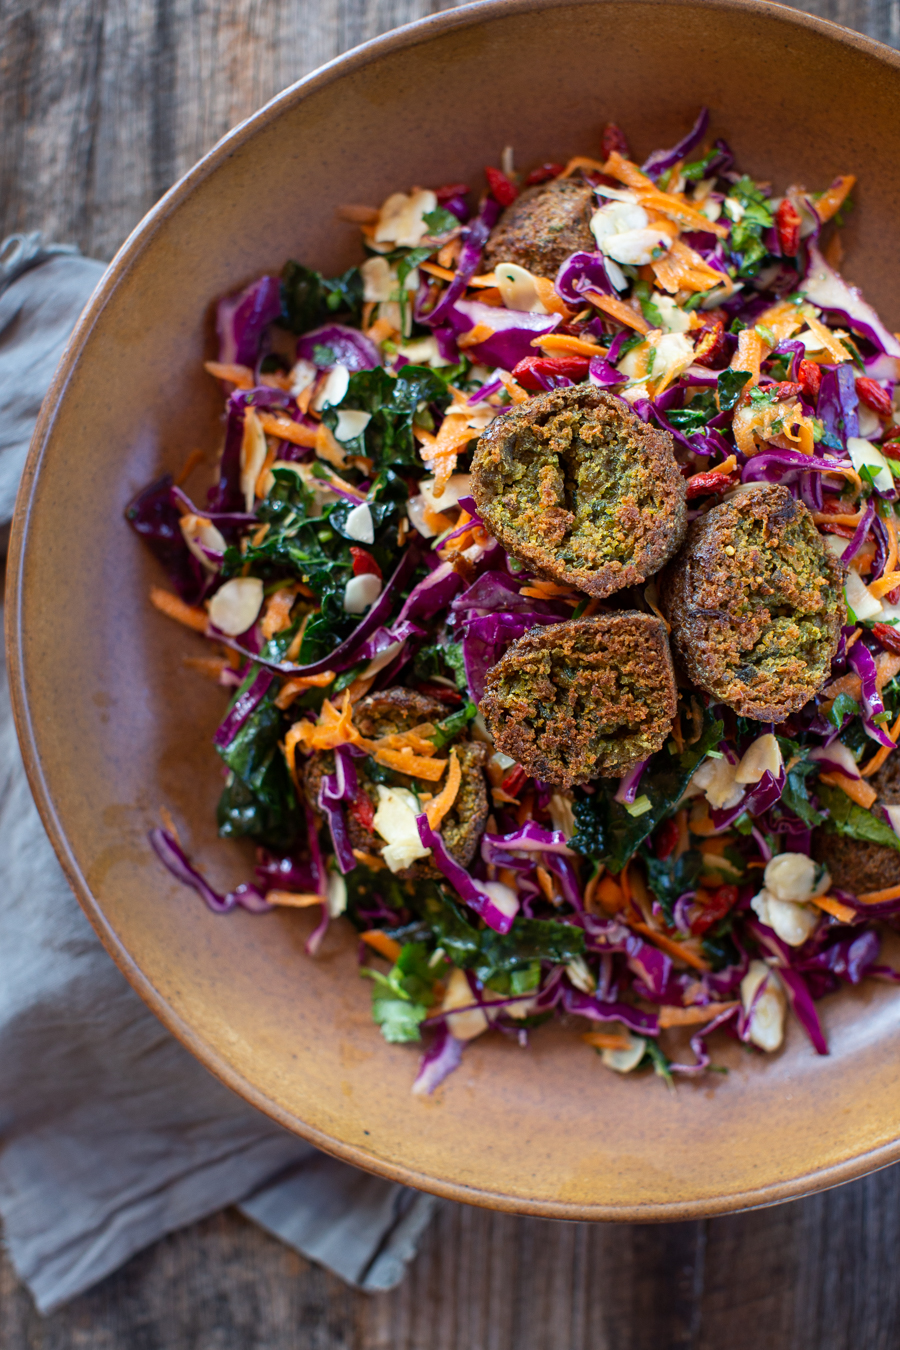 Delicious Vegan Recipes Using Everyday Ingredients ...